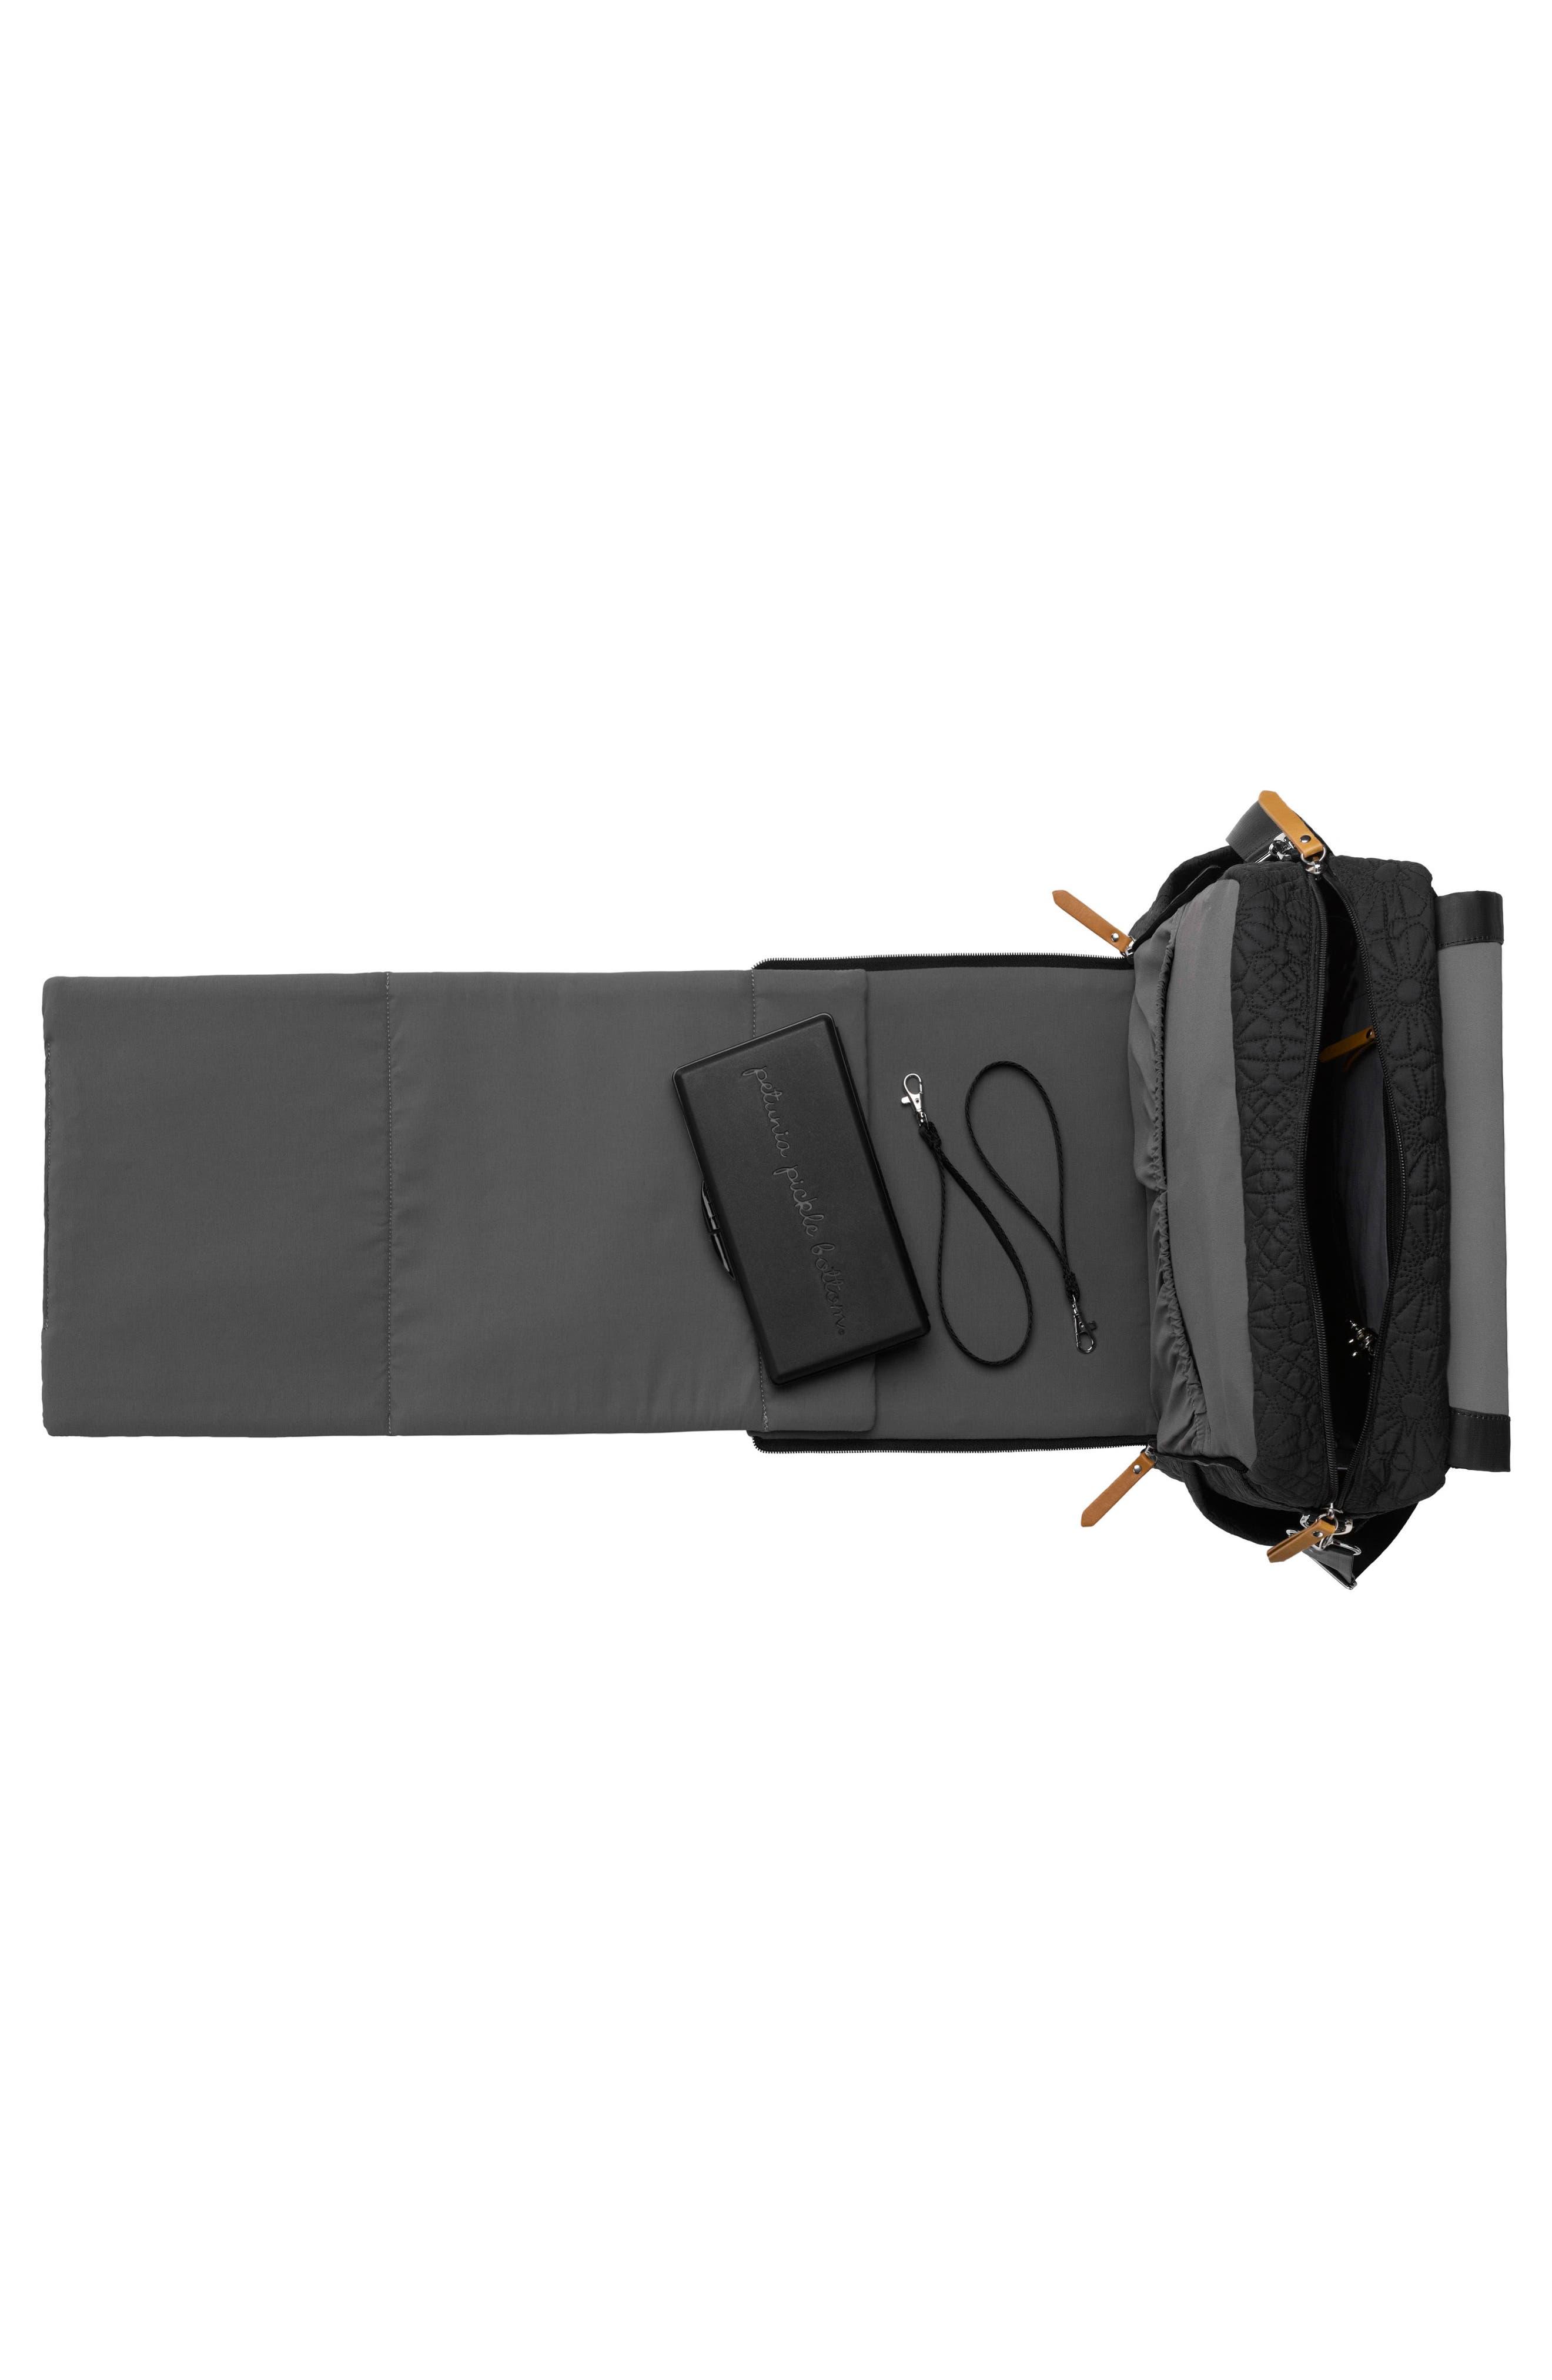 'Embossed Boxy' Backpack Diaper Bag,                             Alternate thumbnail 3, color,                             002